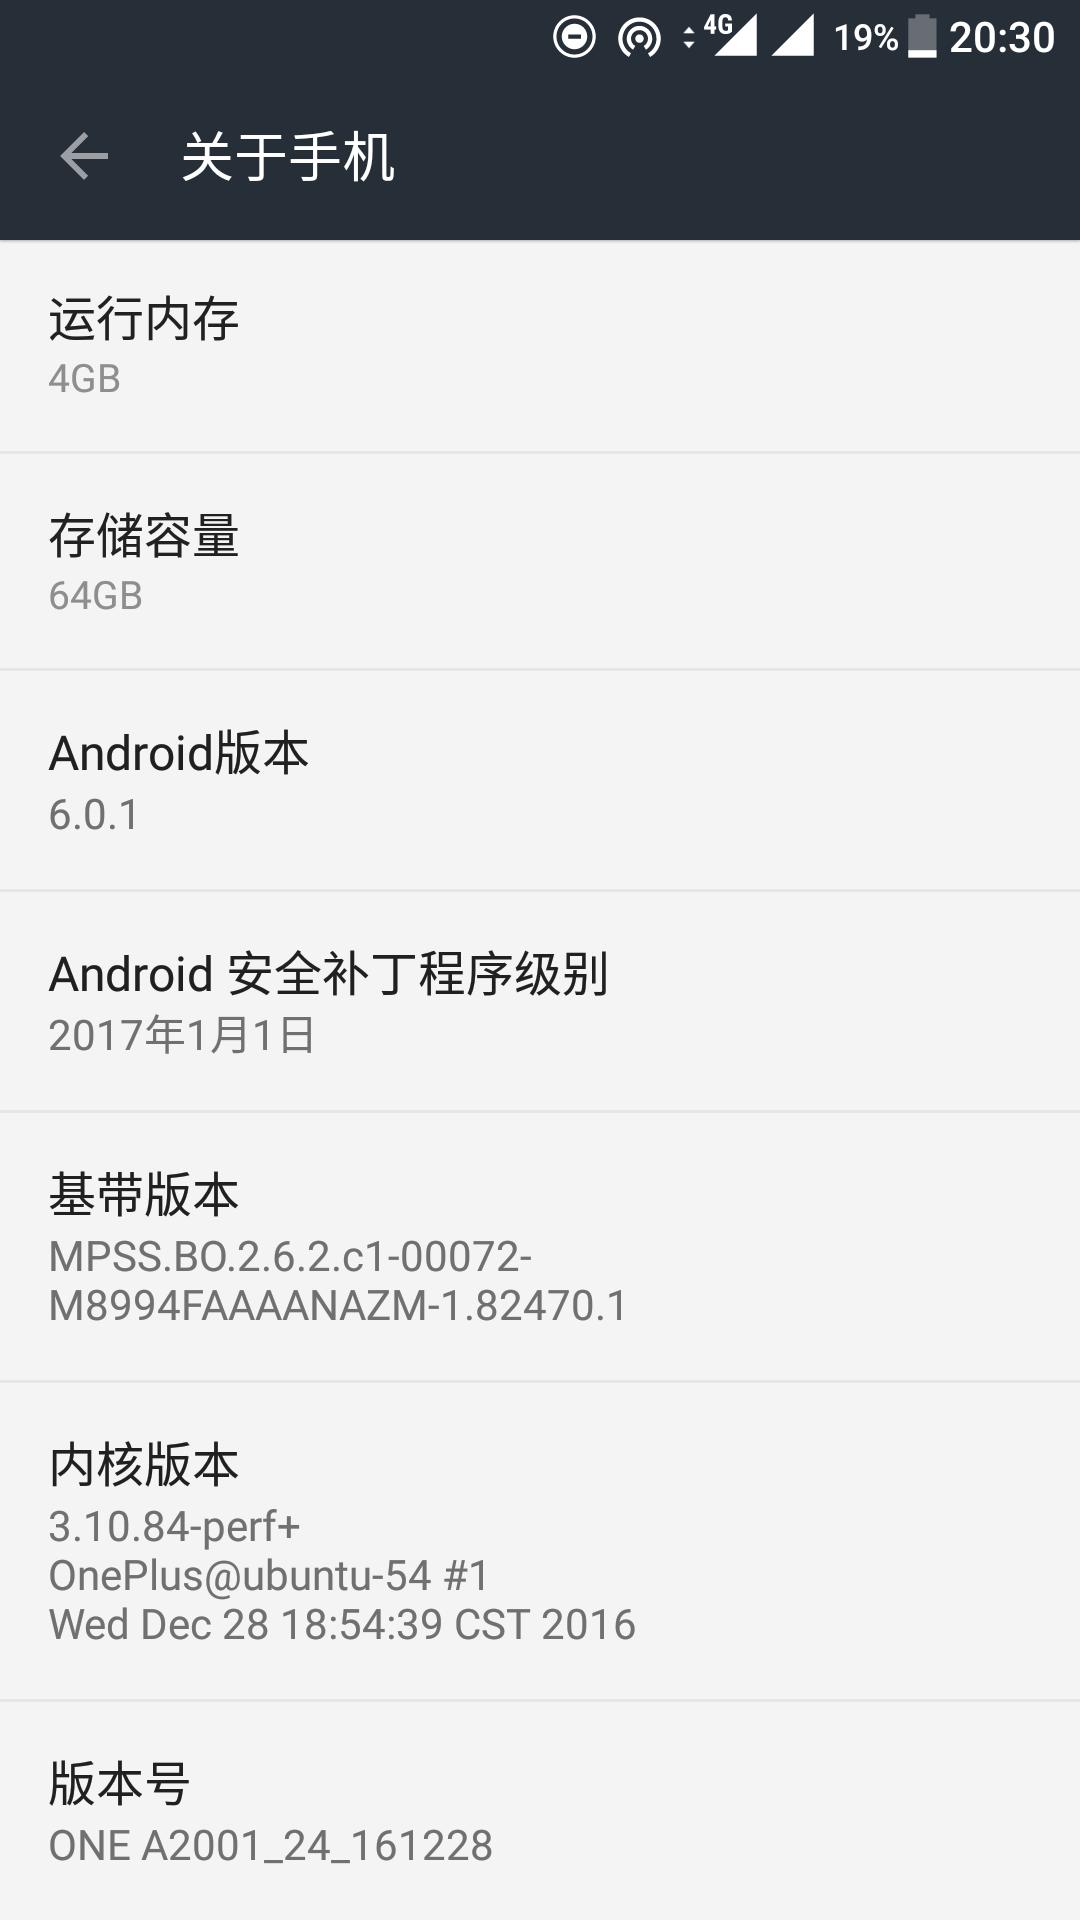 Screenshot_20171103-203018.png